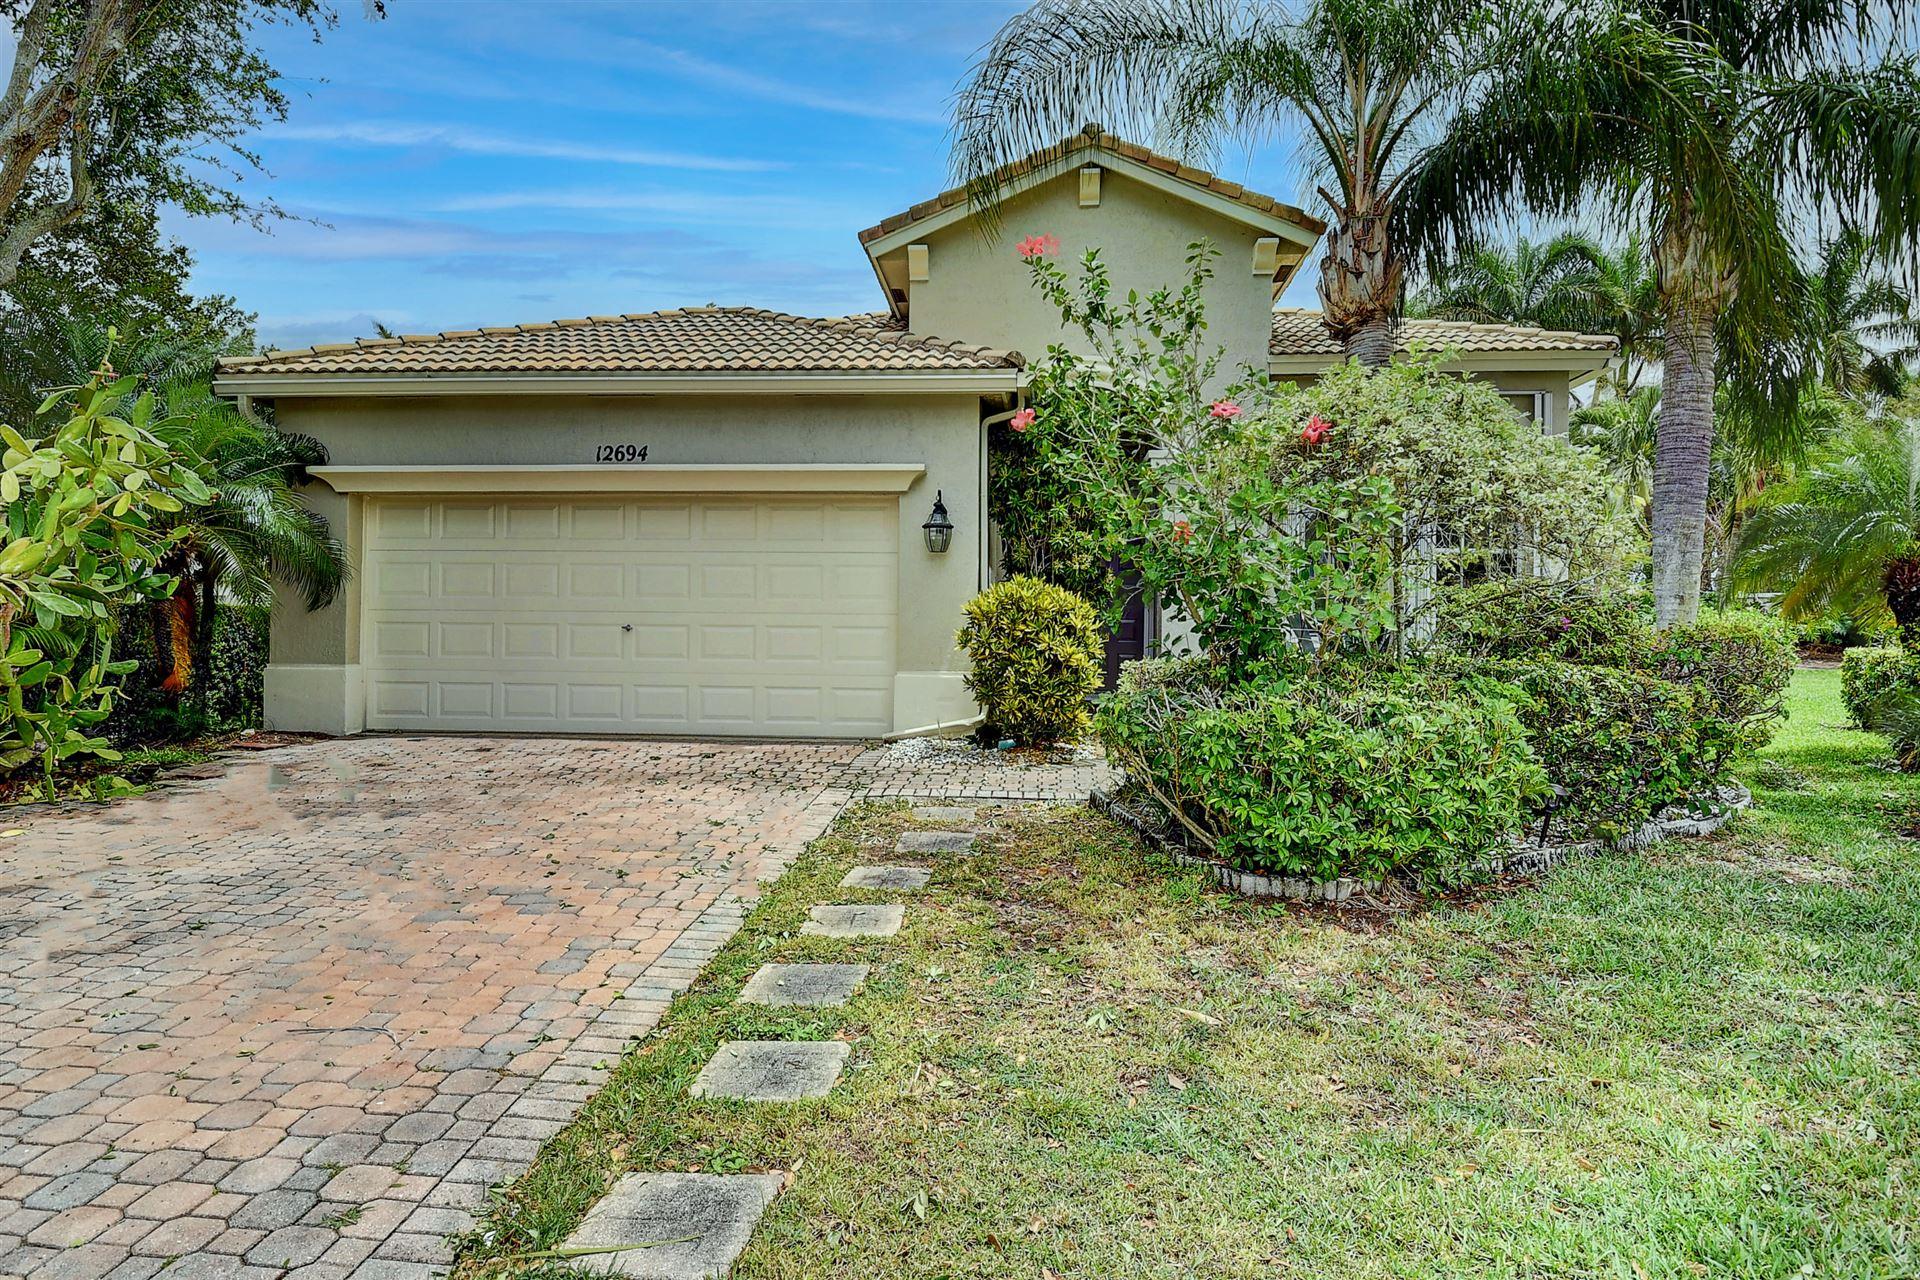 12694 Via Lucia, Boynton Beach, FL 33436 - #: RX-10707438